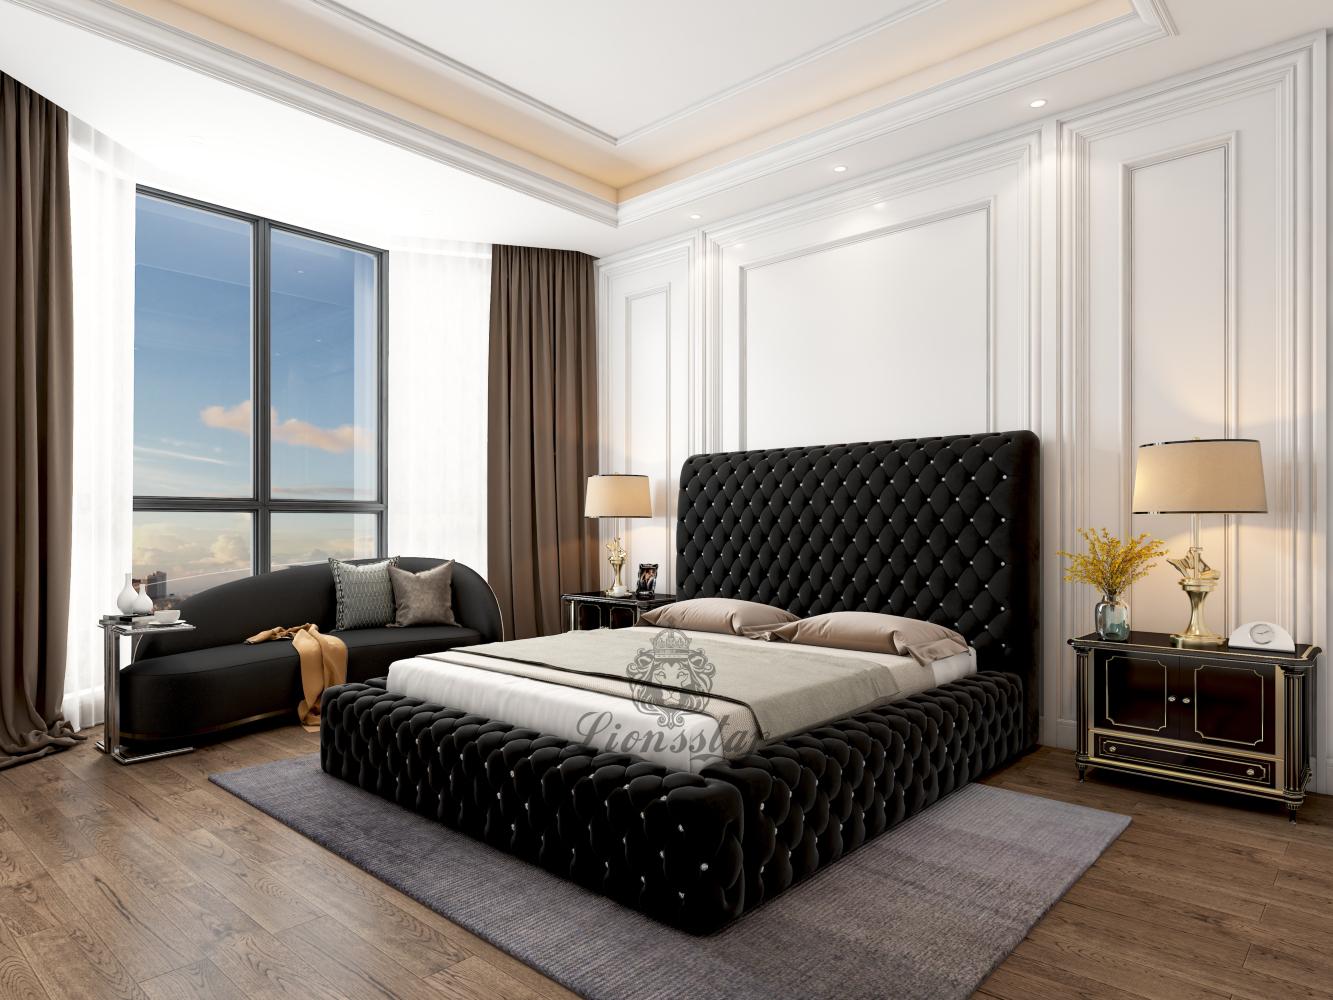 Luxus Designer Bett Chesterfield Big Wall